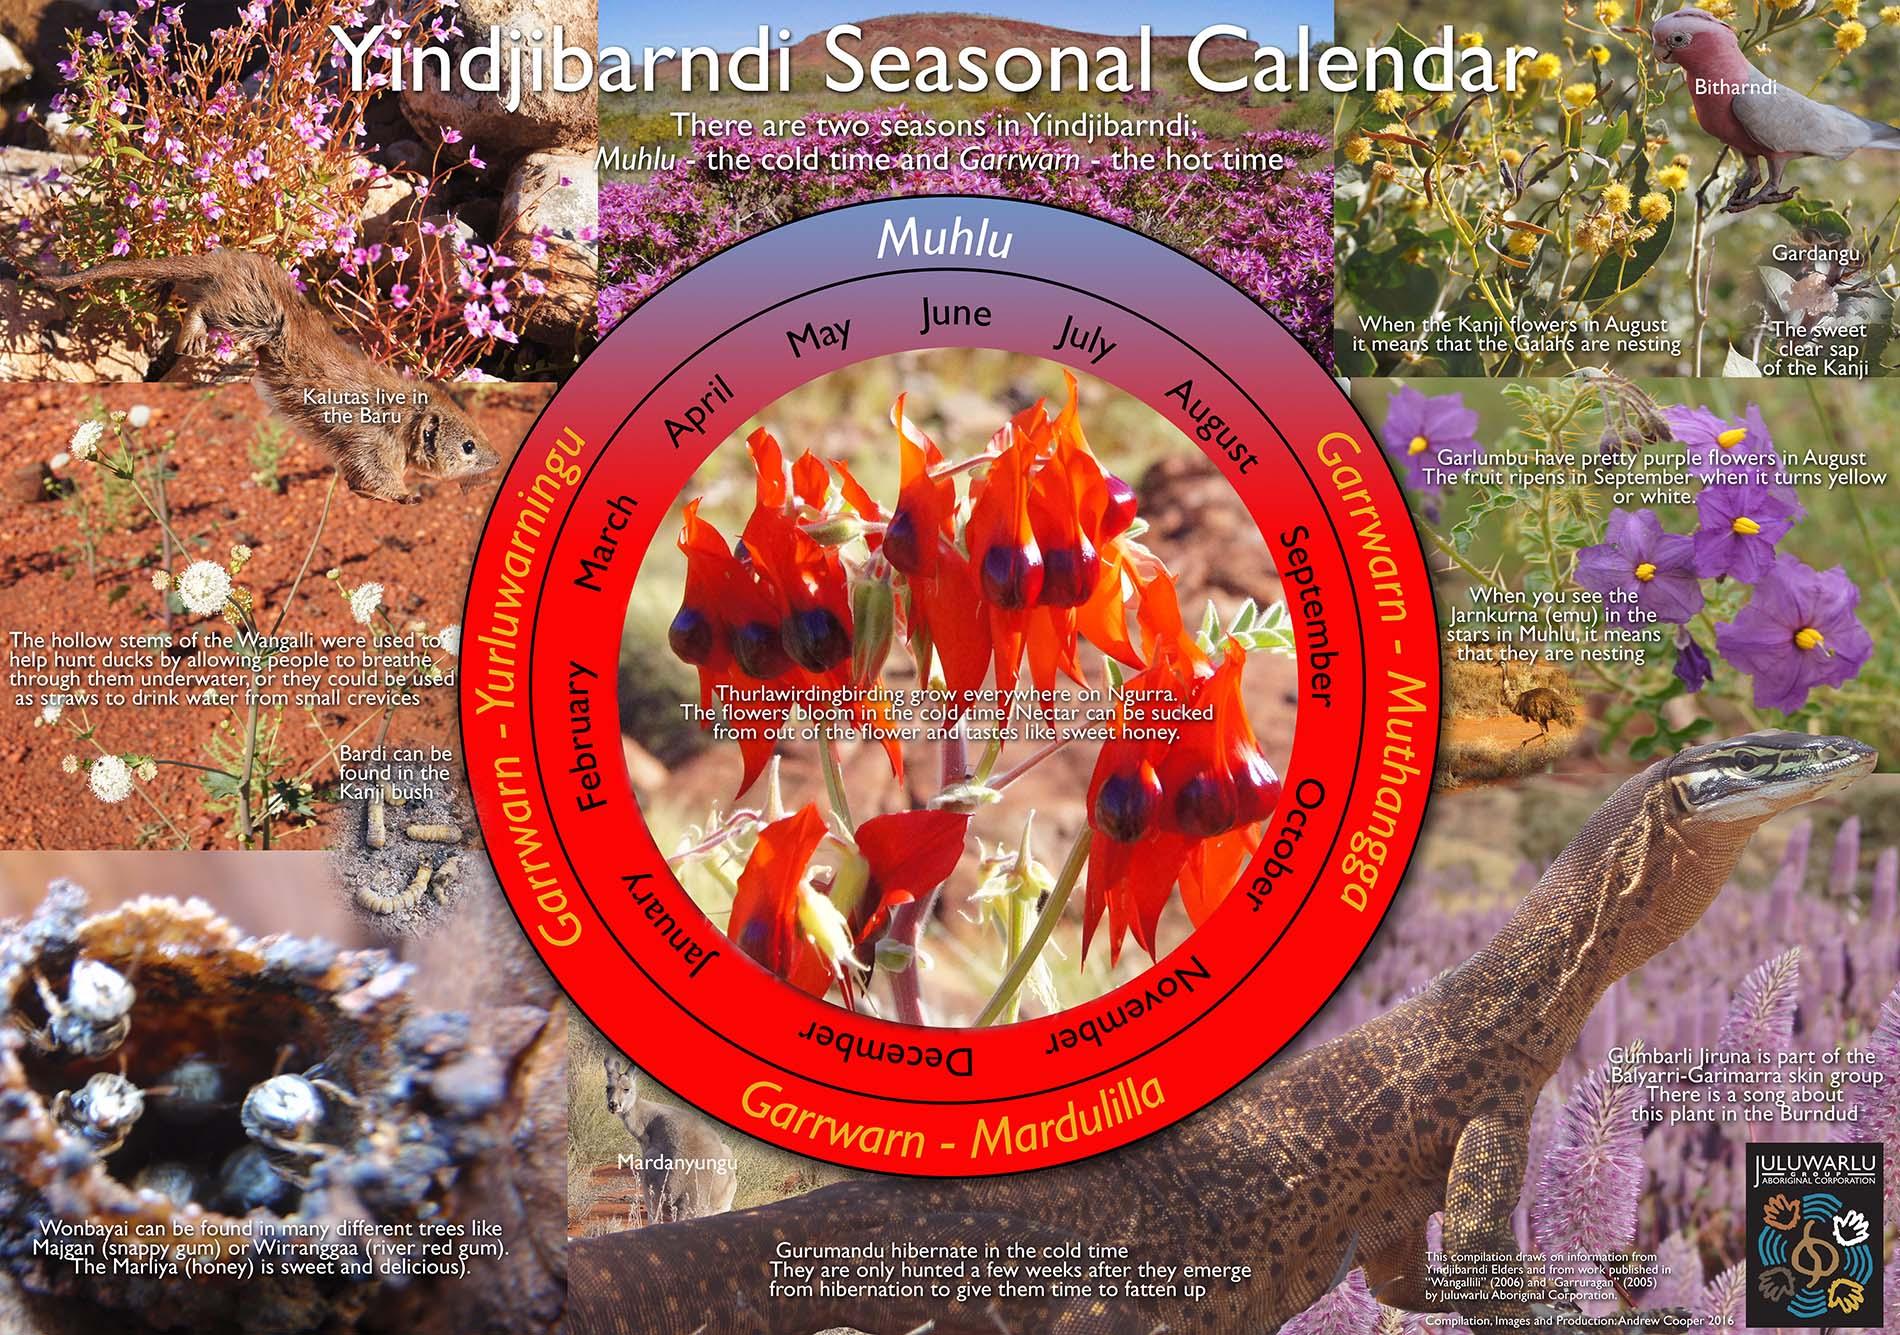 Yindjibarndi Seasonal Calendar image.